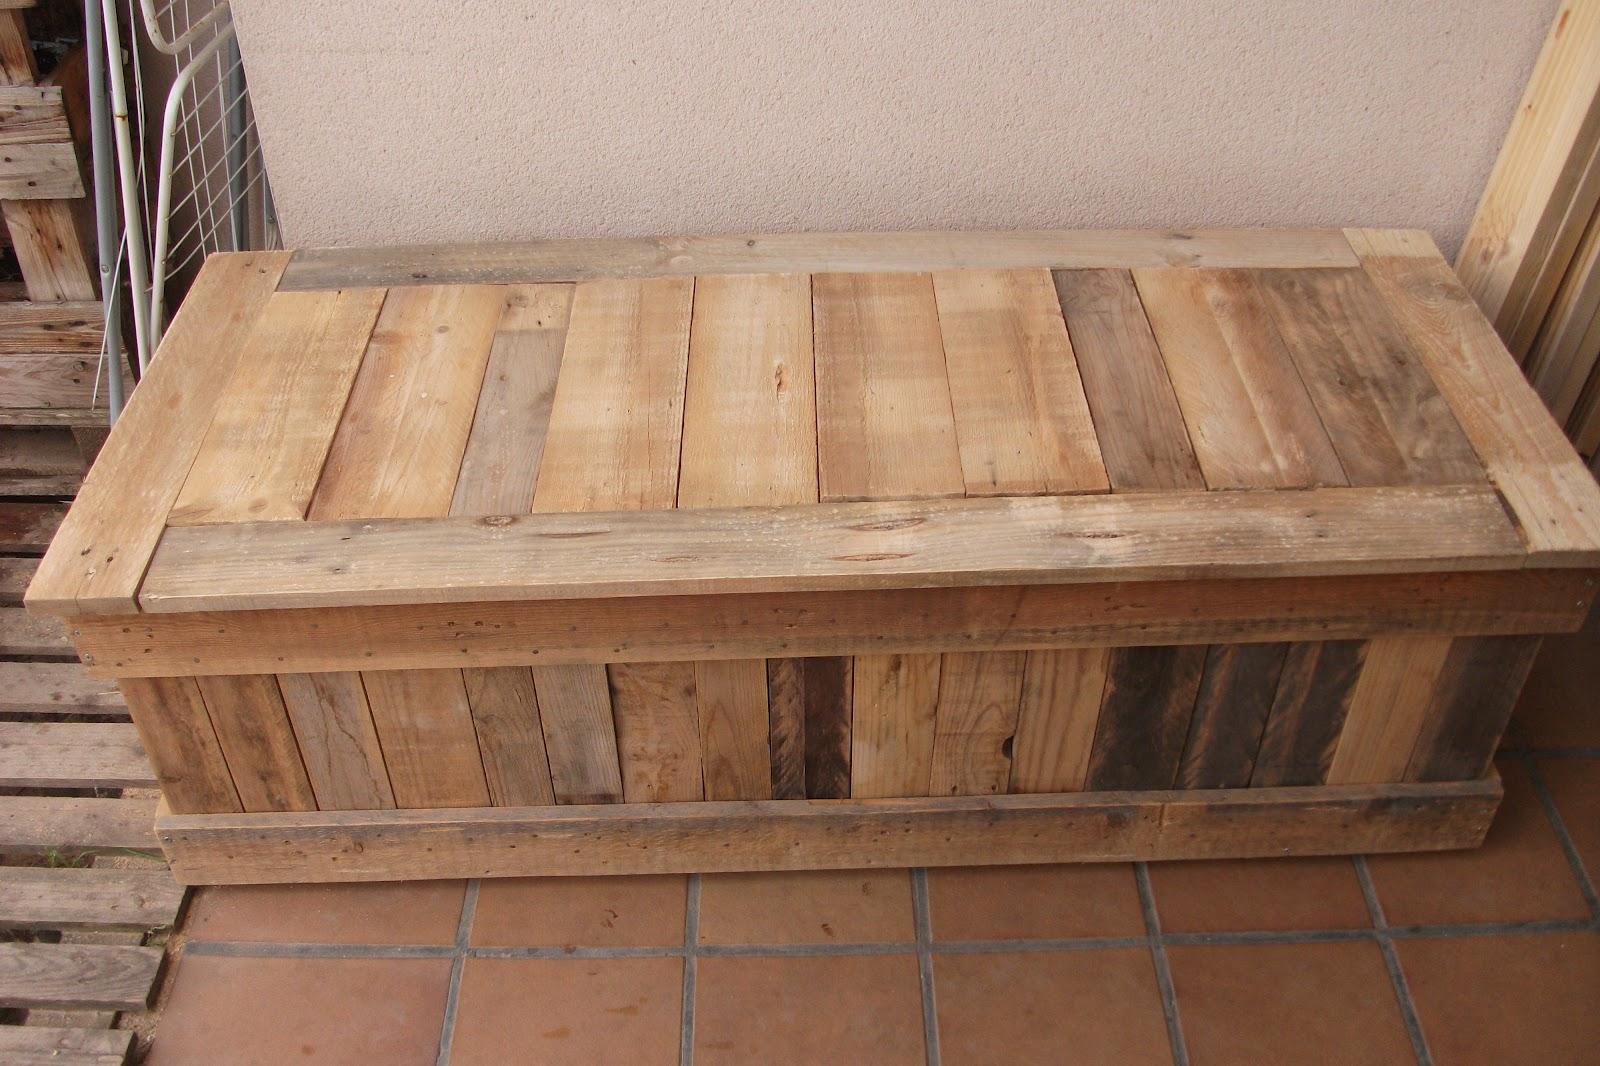 Renovarte con palets - Banco baul madera ...